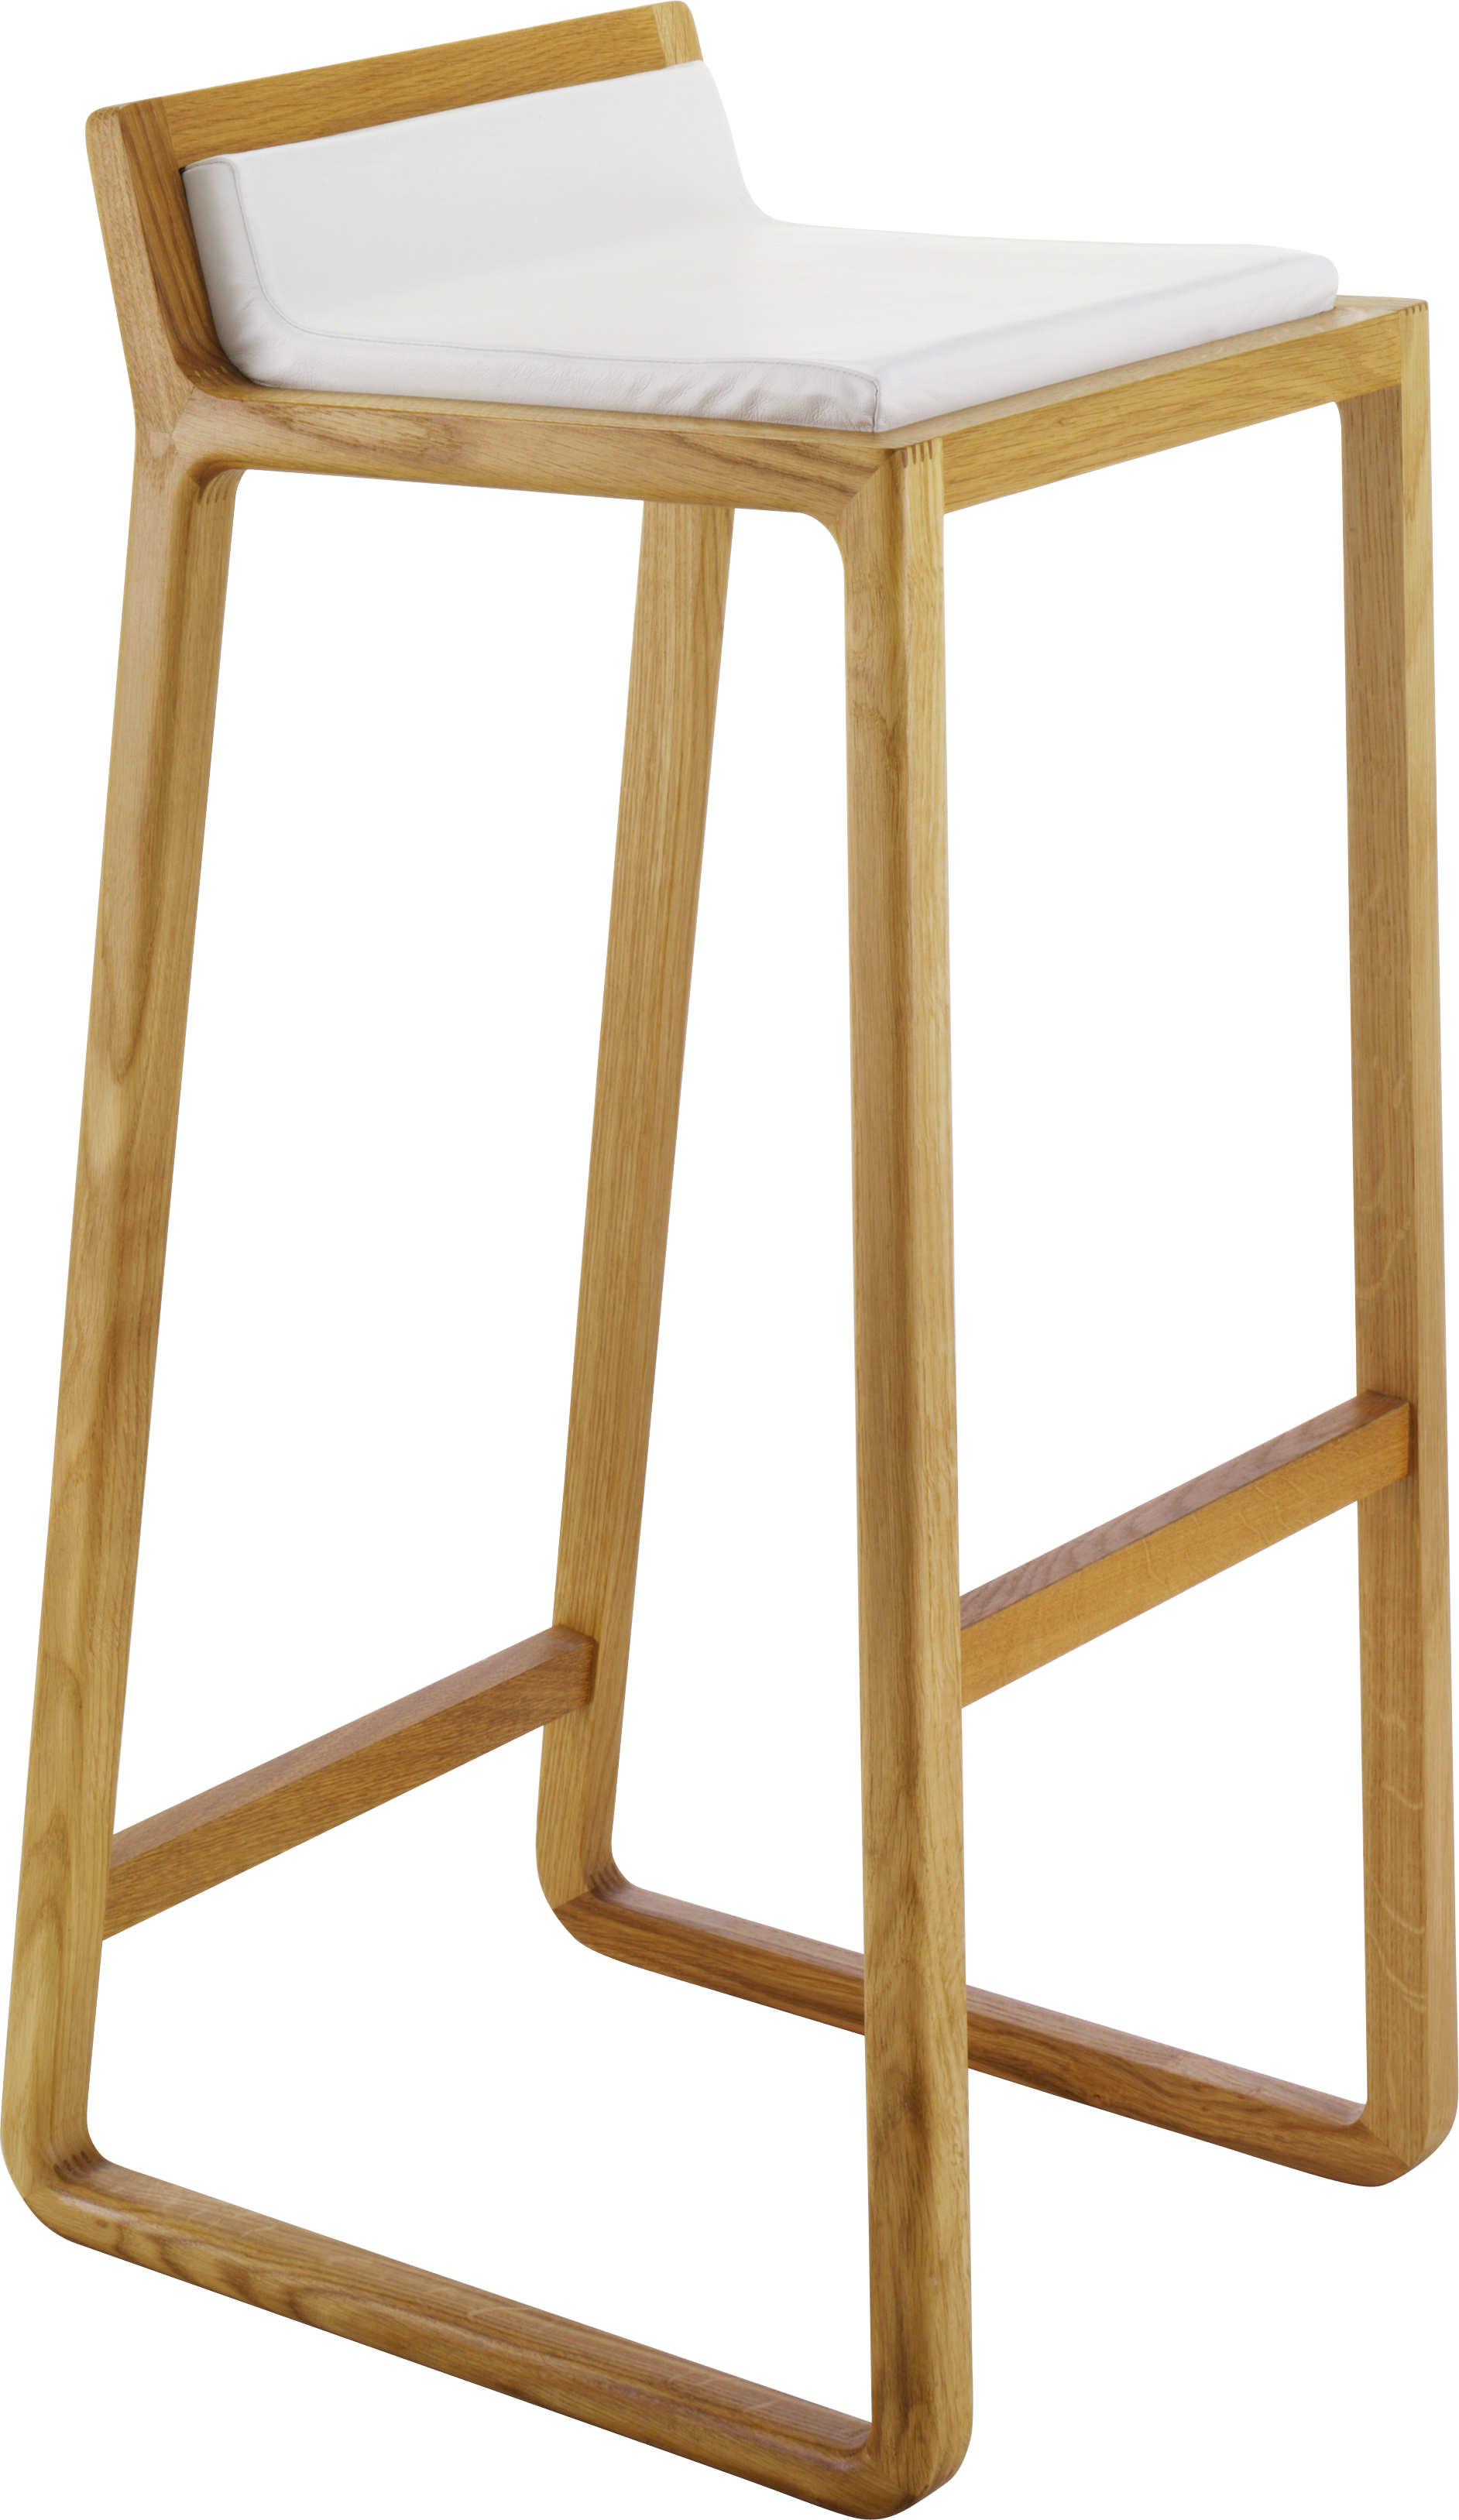 joe tabouret de bar en ch ne massif et cuir bar stool pinterest. Black Bedroom Furniture Sets. Home Design Ideas